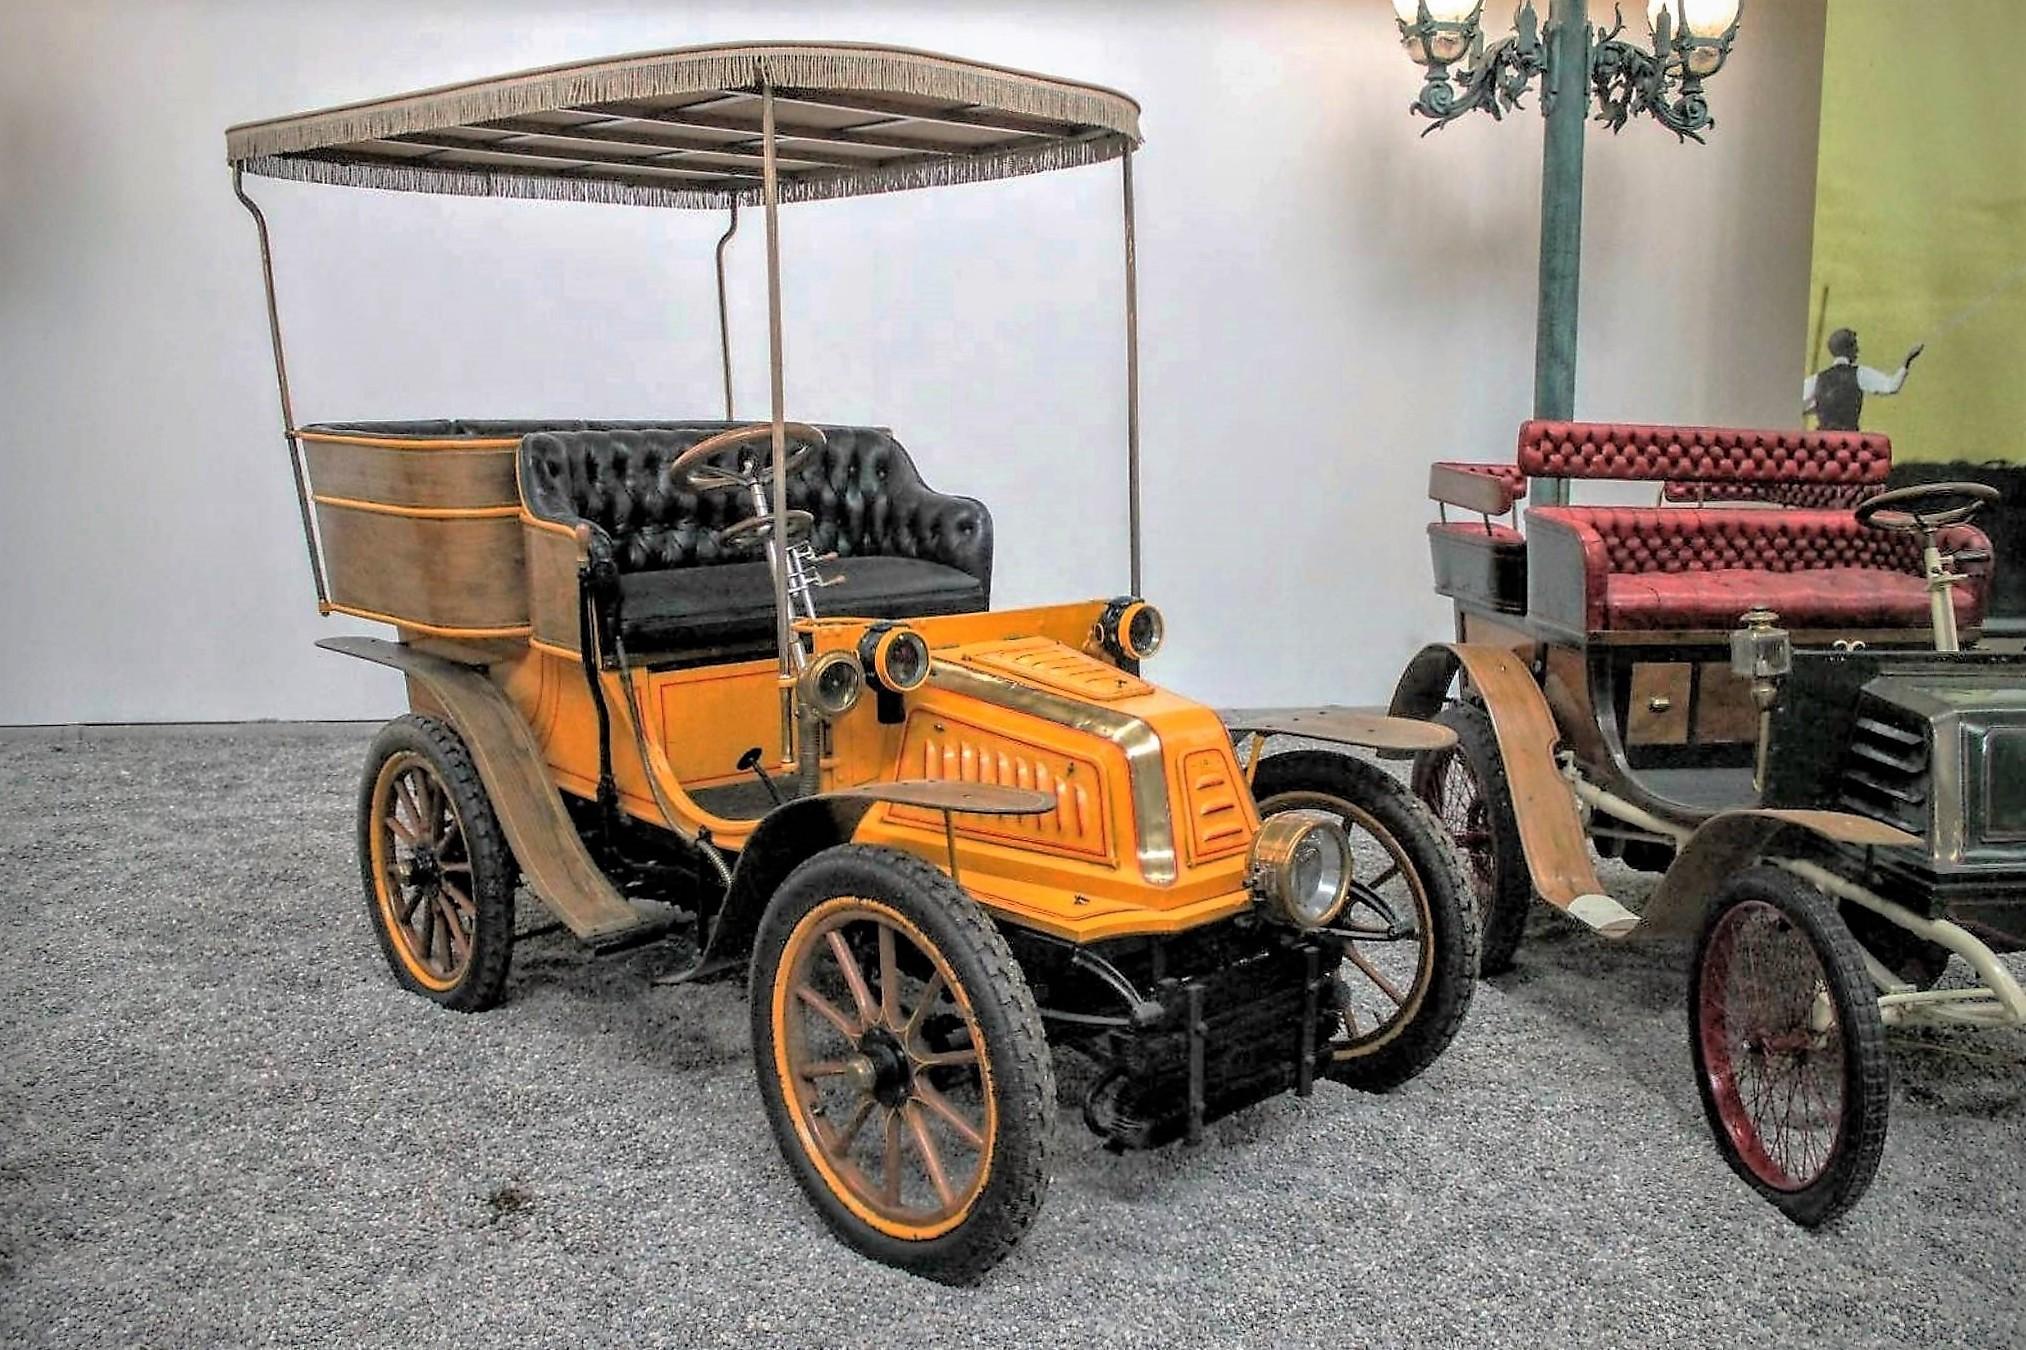 Fouillaron 10 HP de 1906